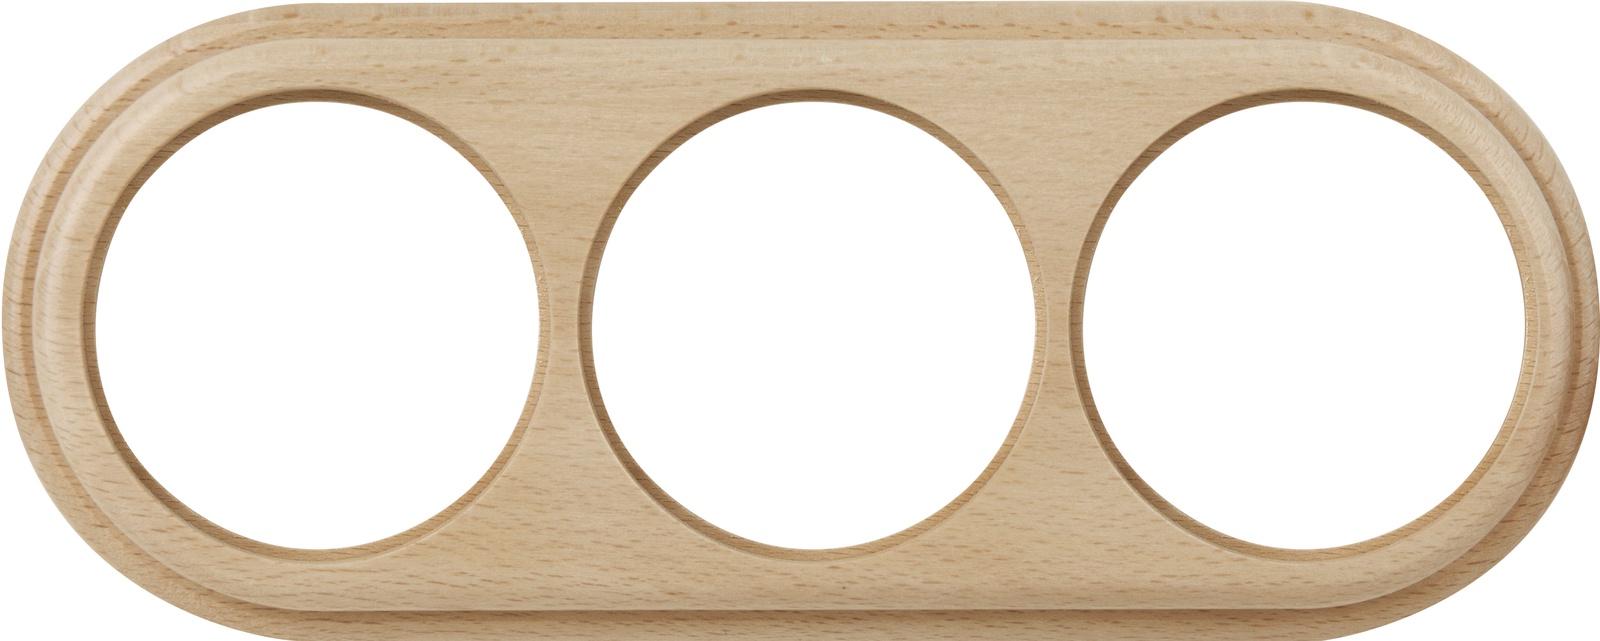 WL15-frame-03 / Рамка на 3 поста (светлый бук) цена и фото